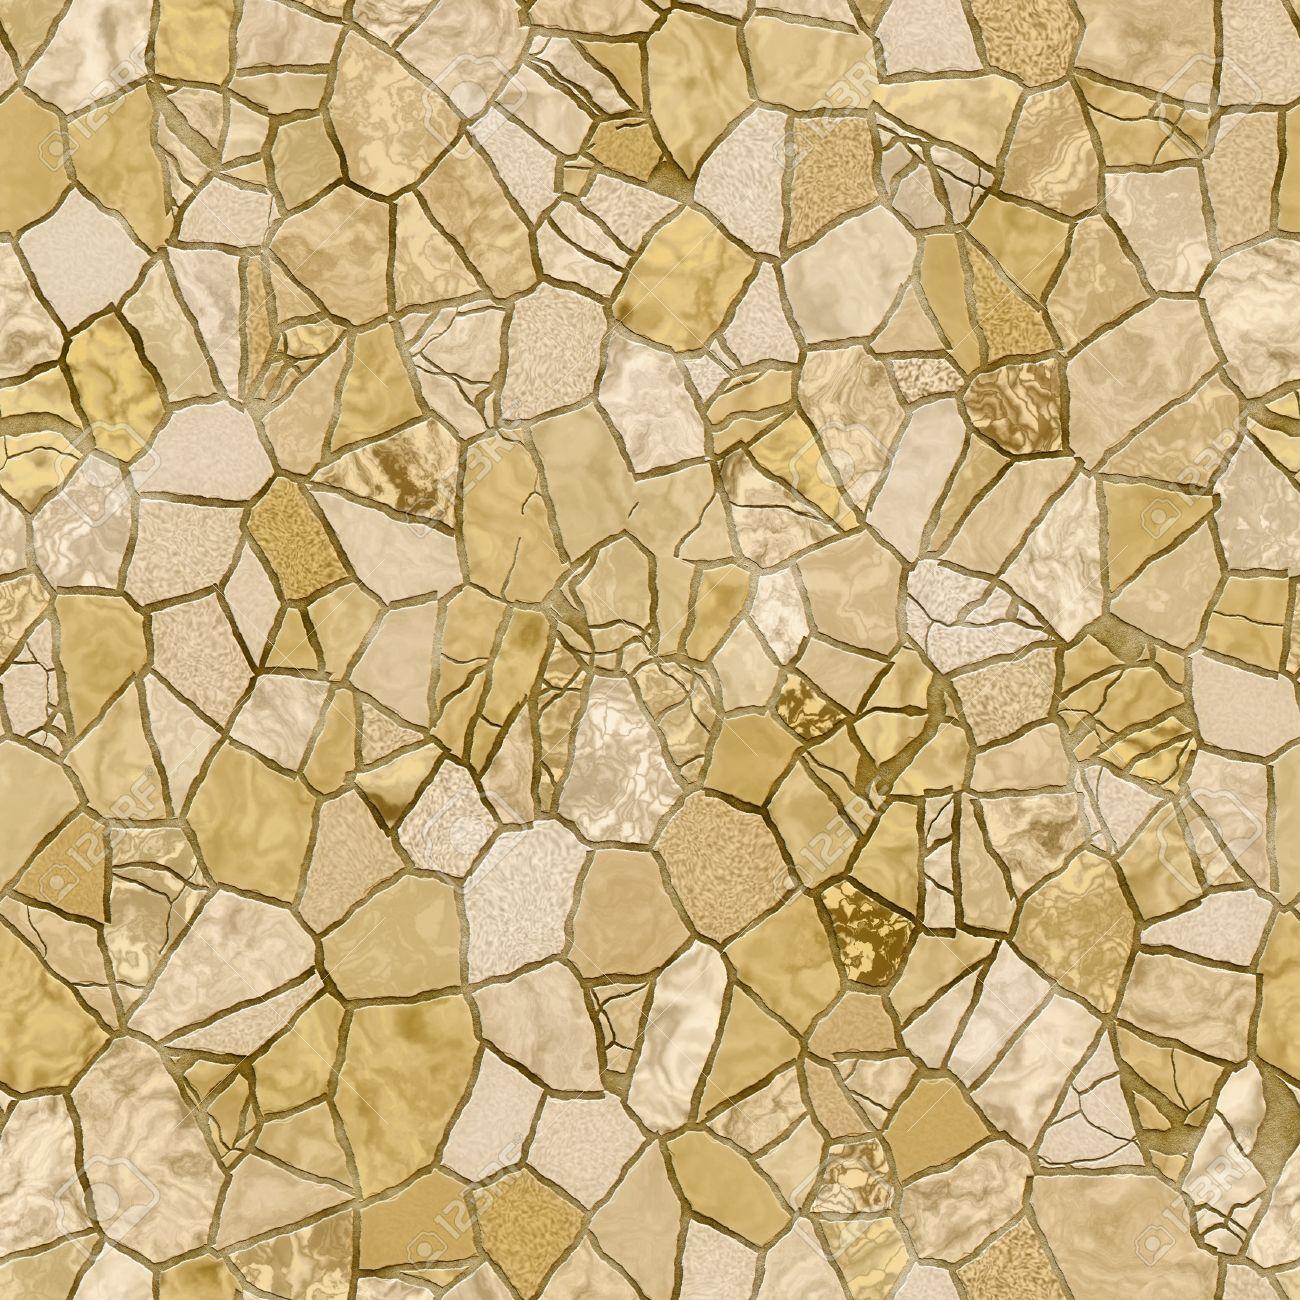 Tile Floor Texture Seamless